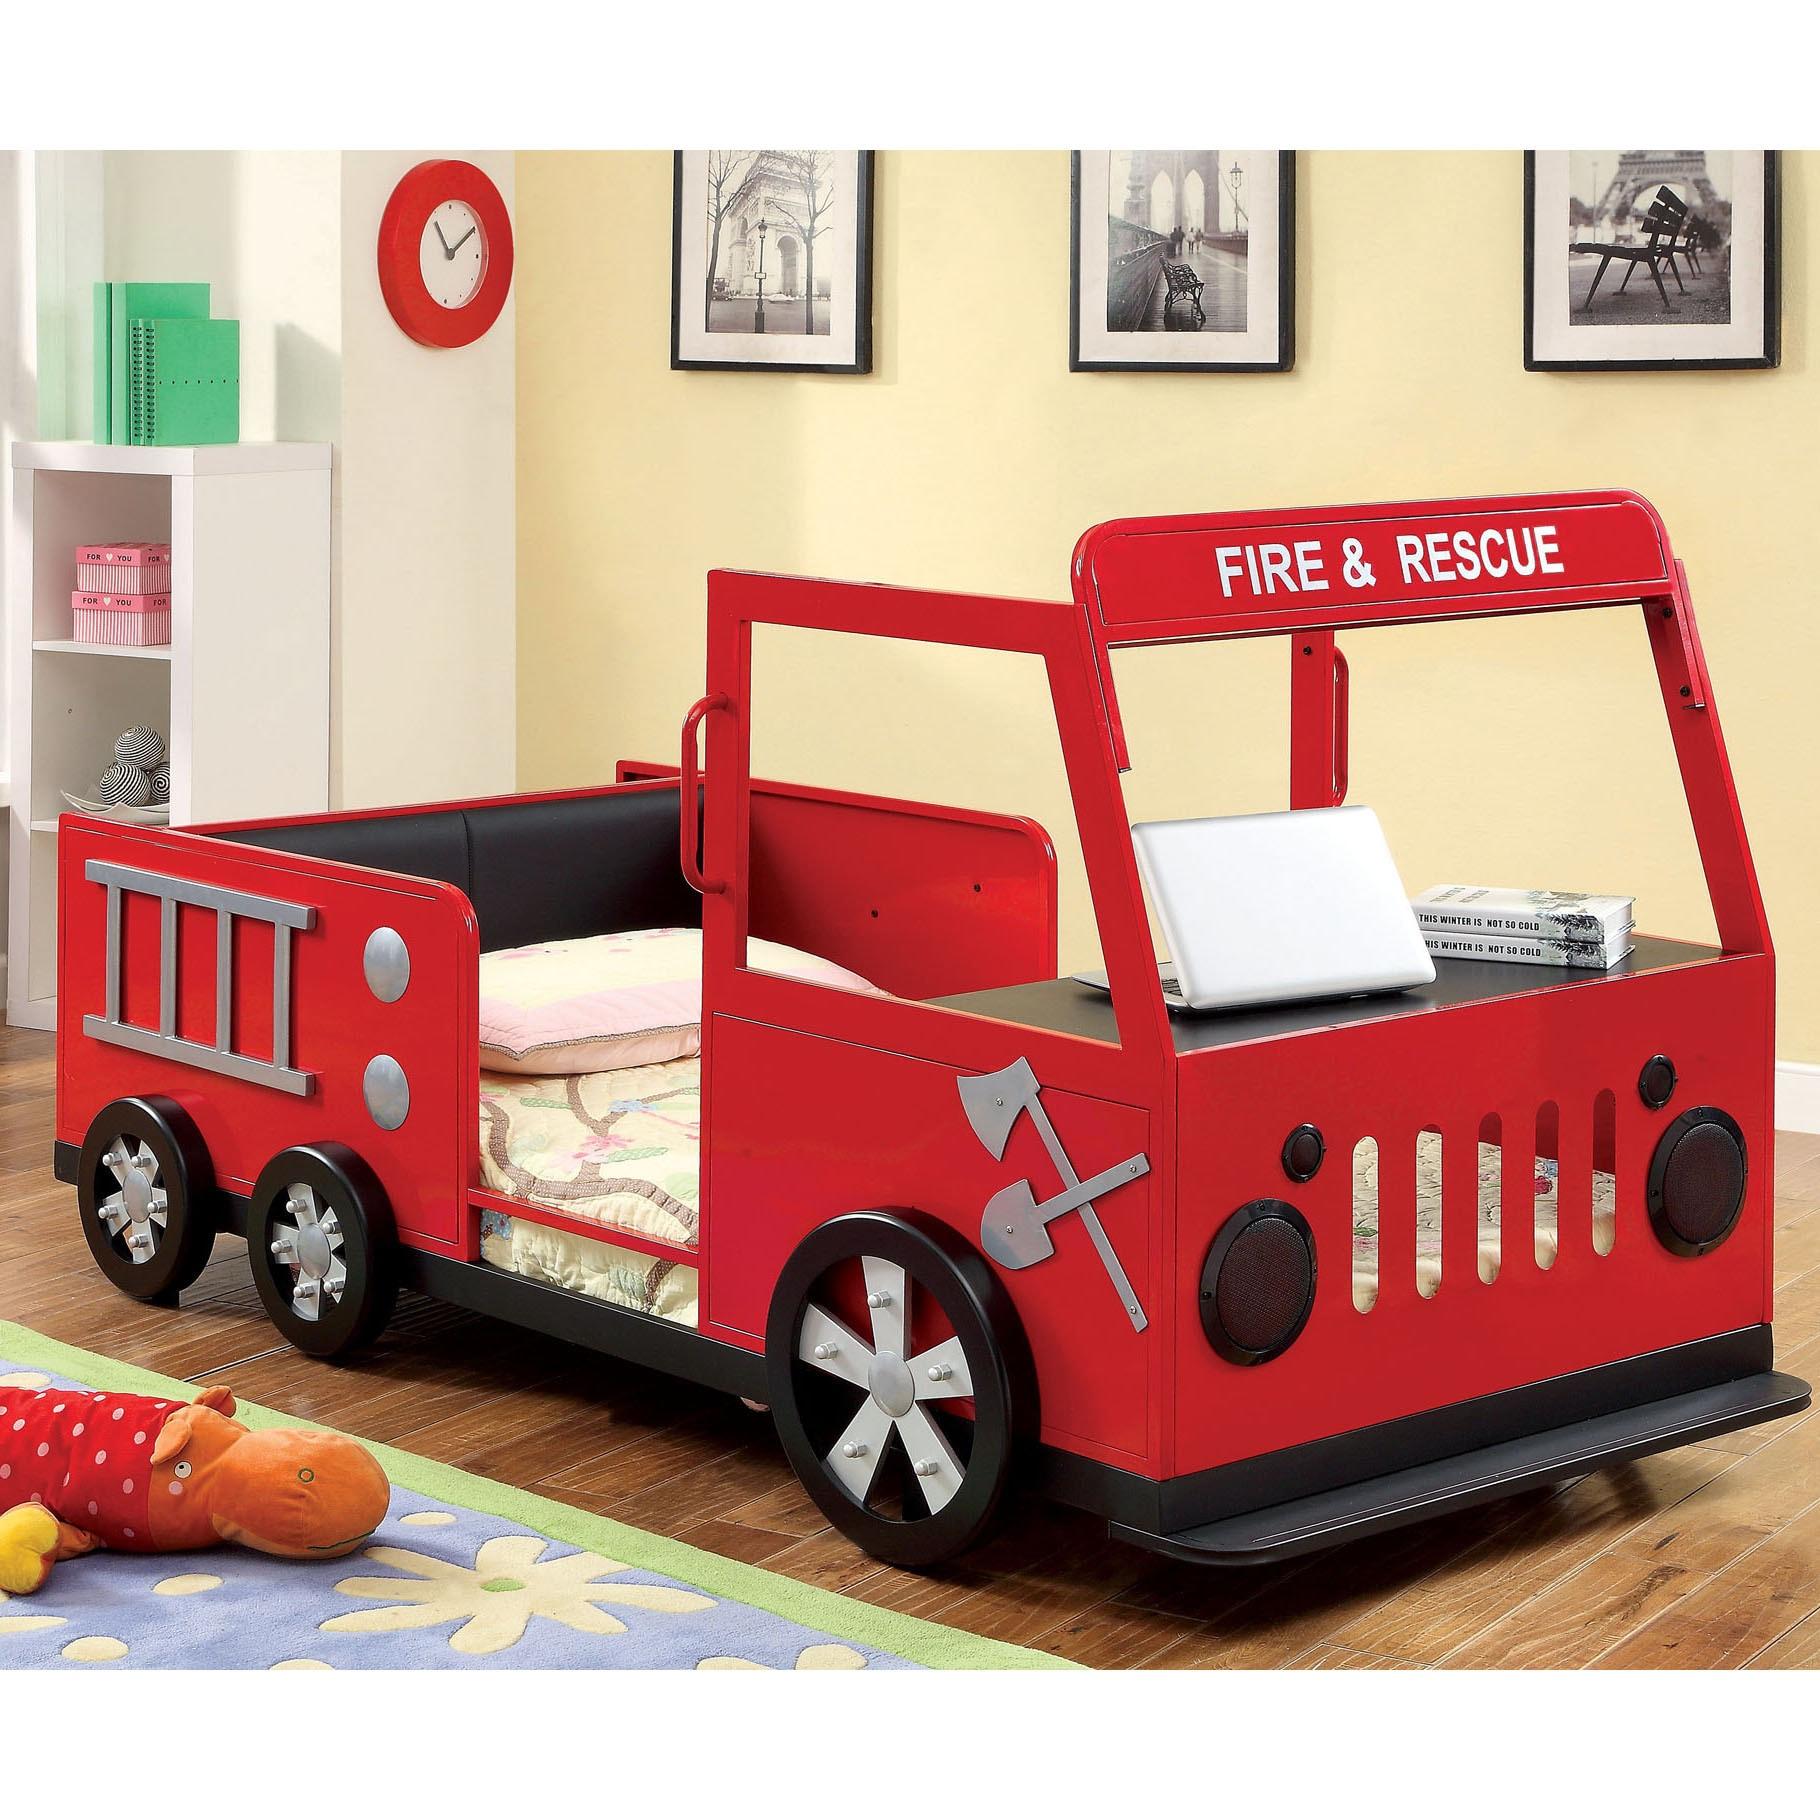 Furniture of America Rescue Team Fire Truck Metal Youth B...